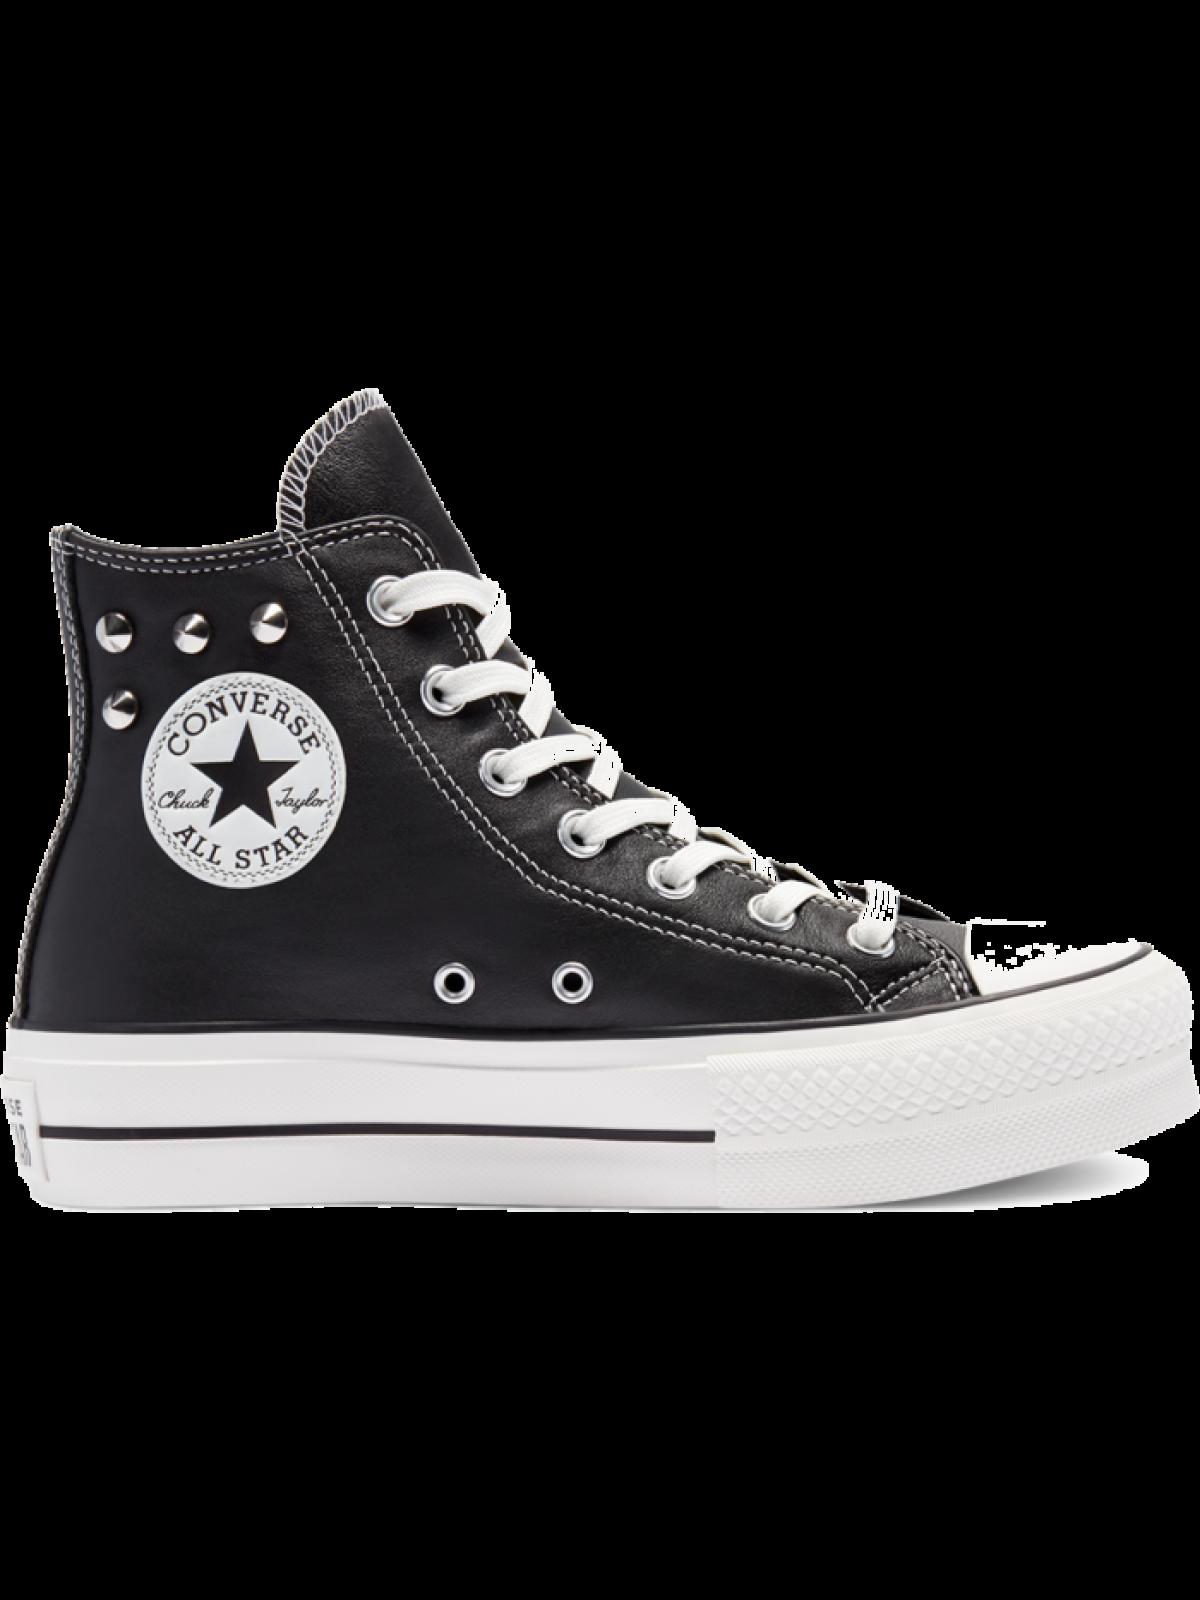 Converse Chuck Taylor all star Lift cuir plateforme Studs noir